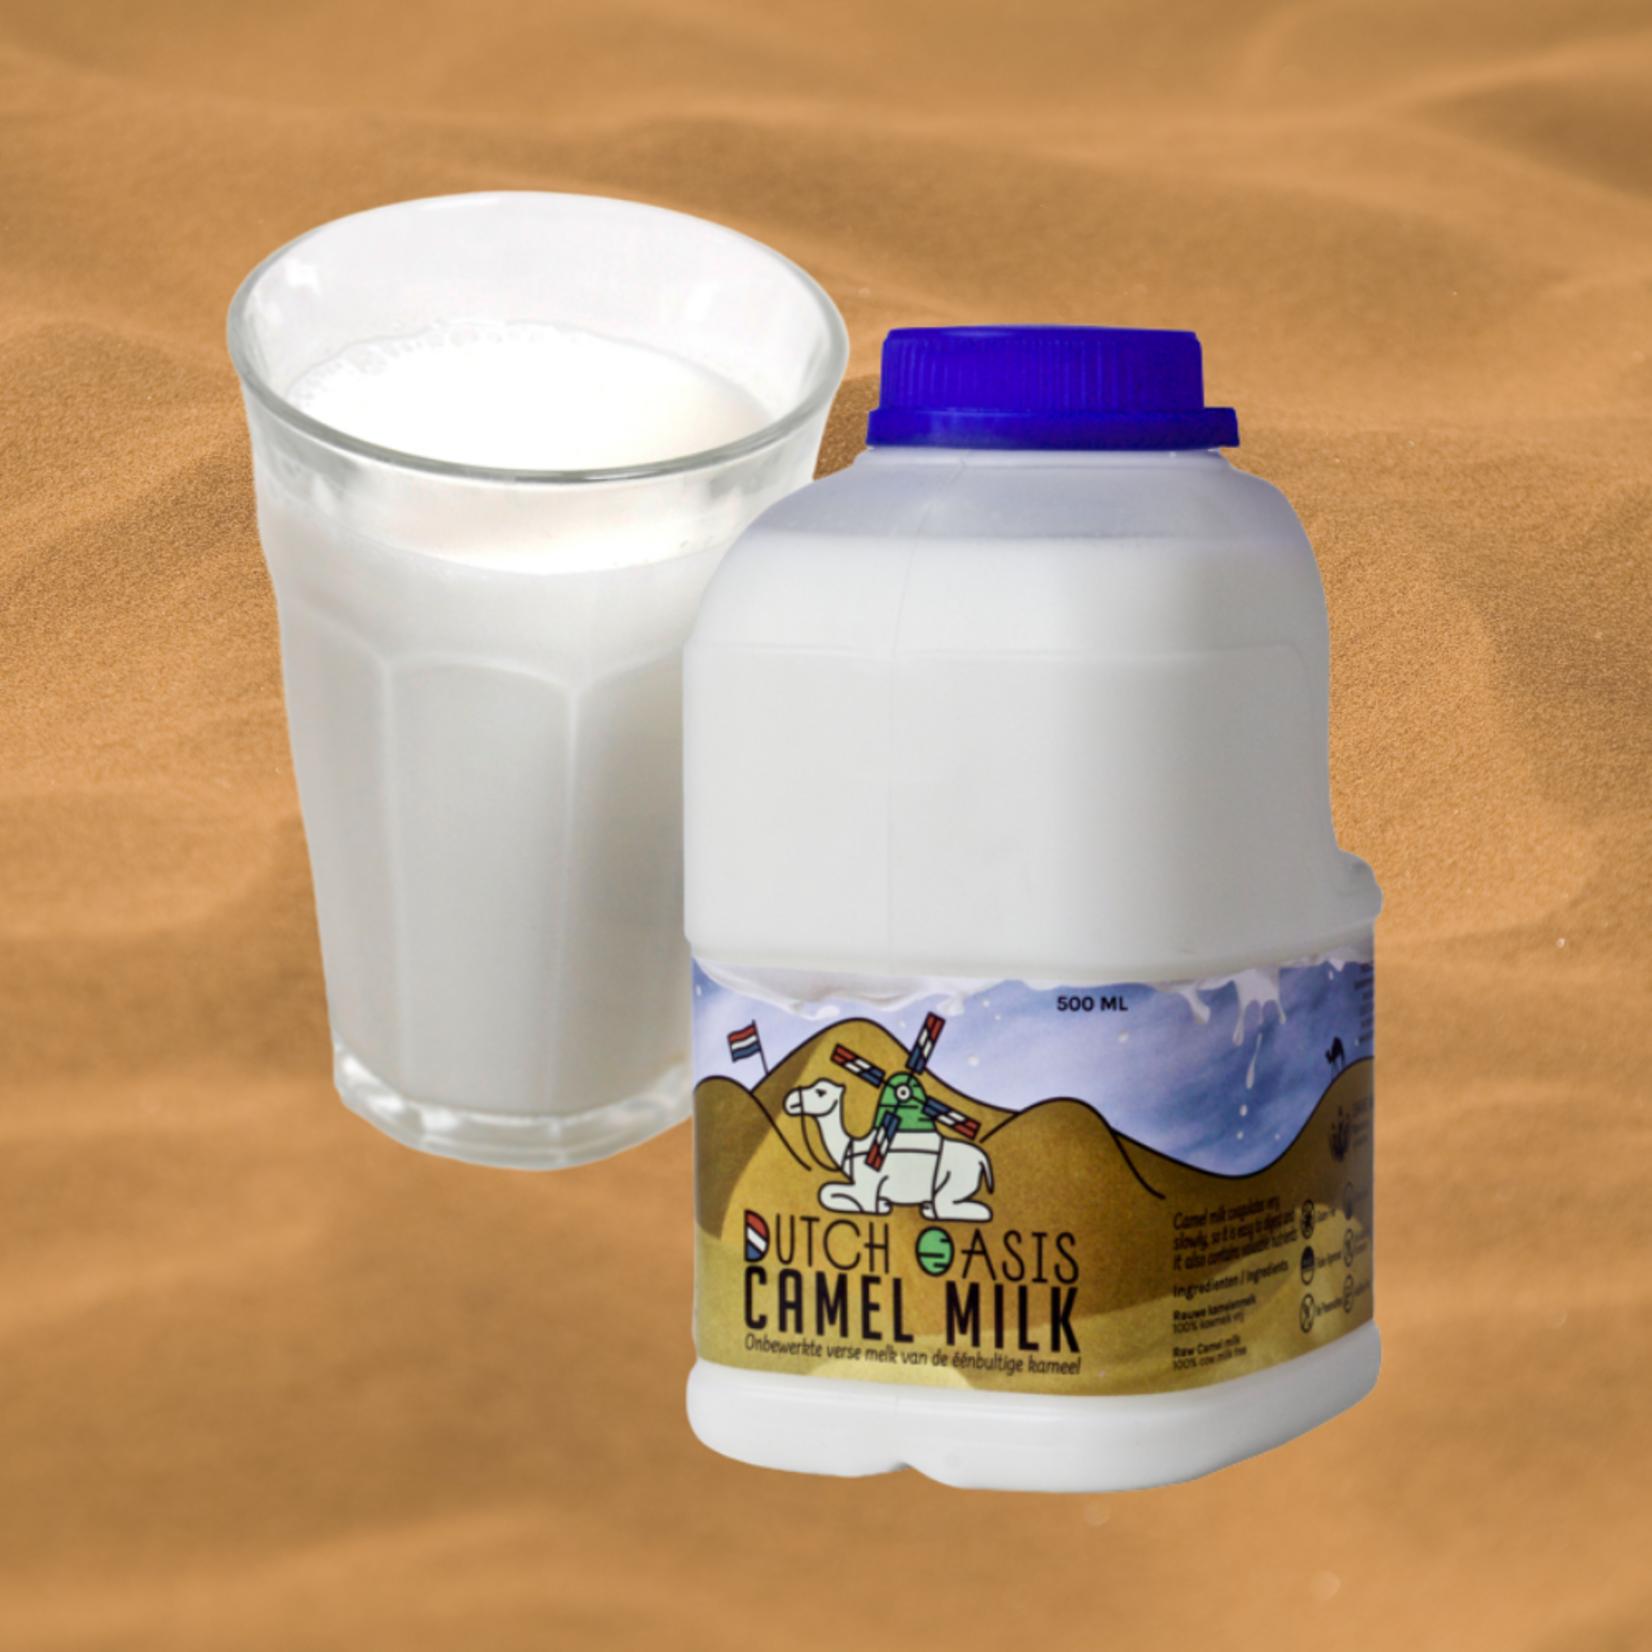 Dutch Oasis 14 bottles (á 500ml) frozen and raw camel milk